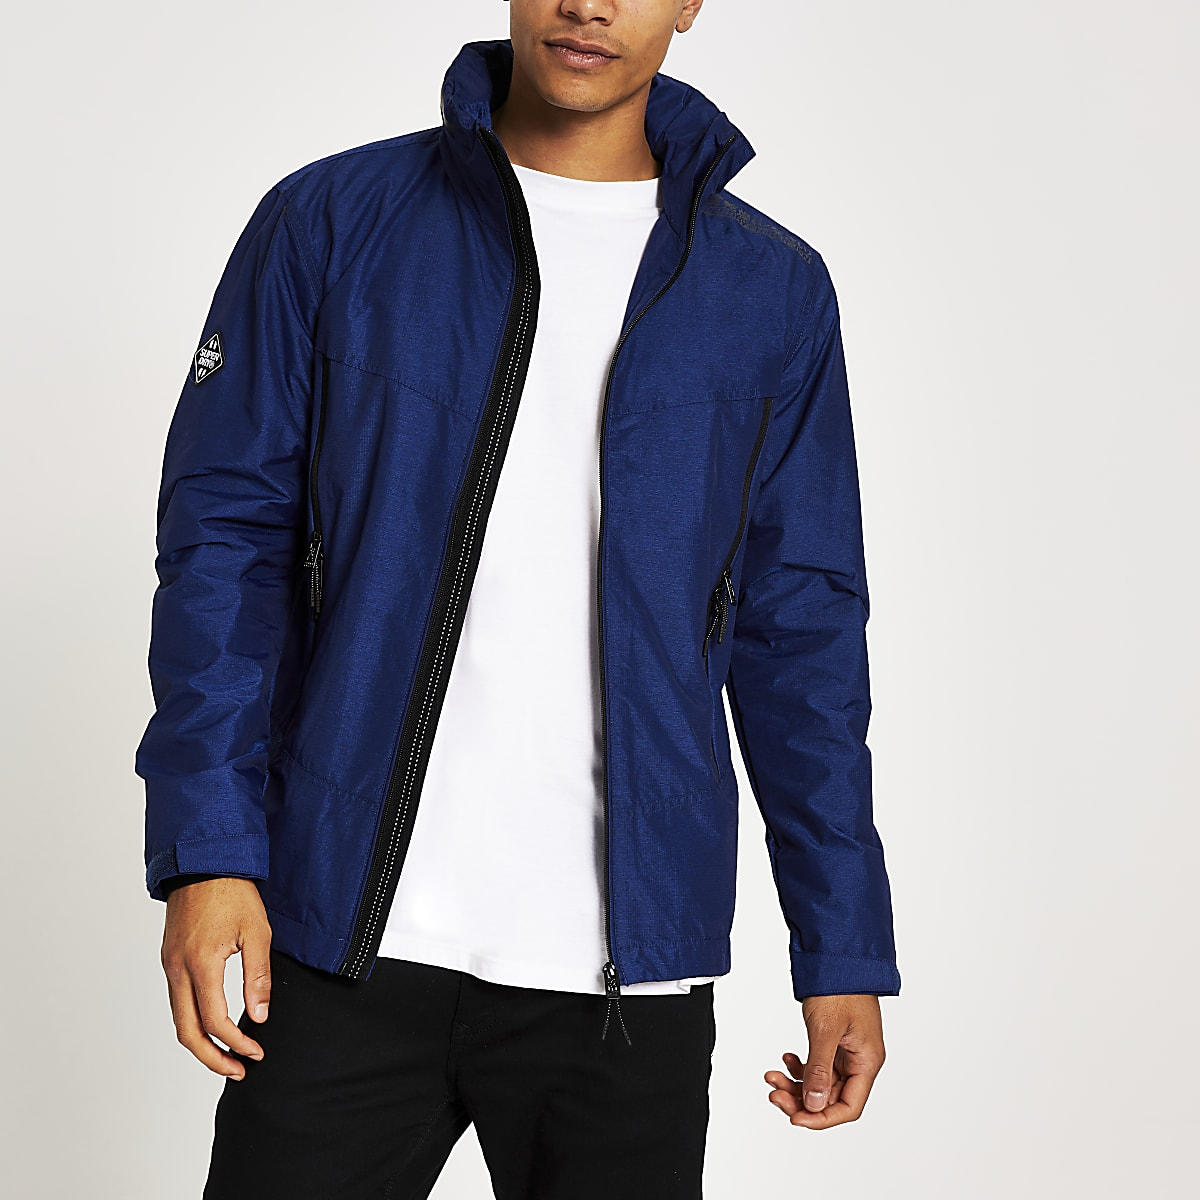 Superdry blue lightweight jacket